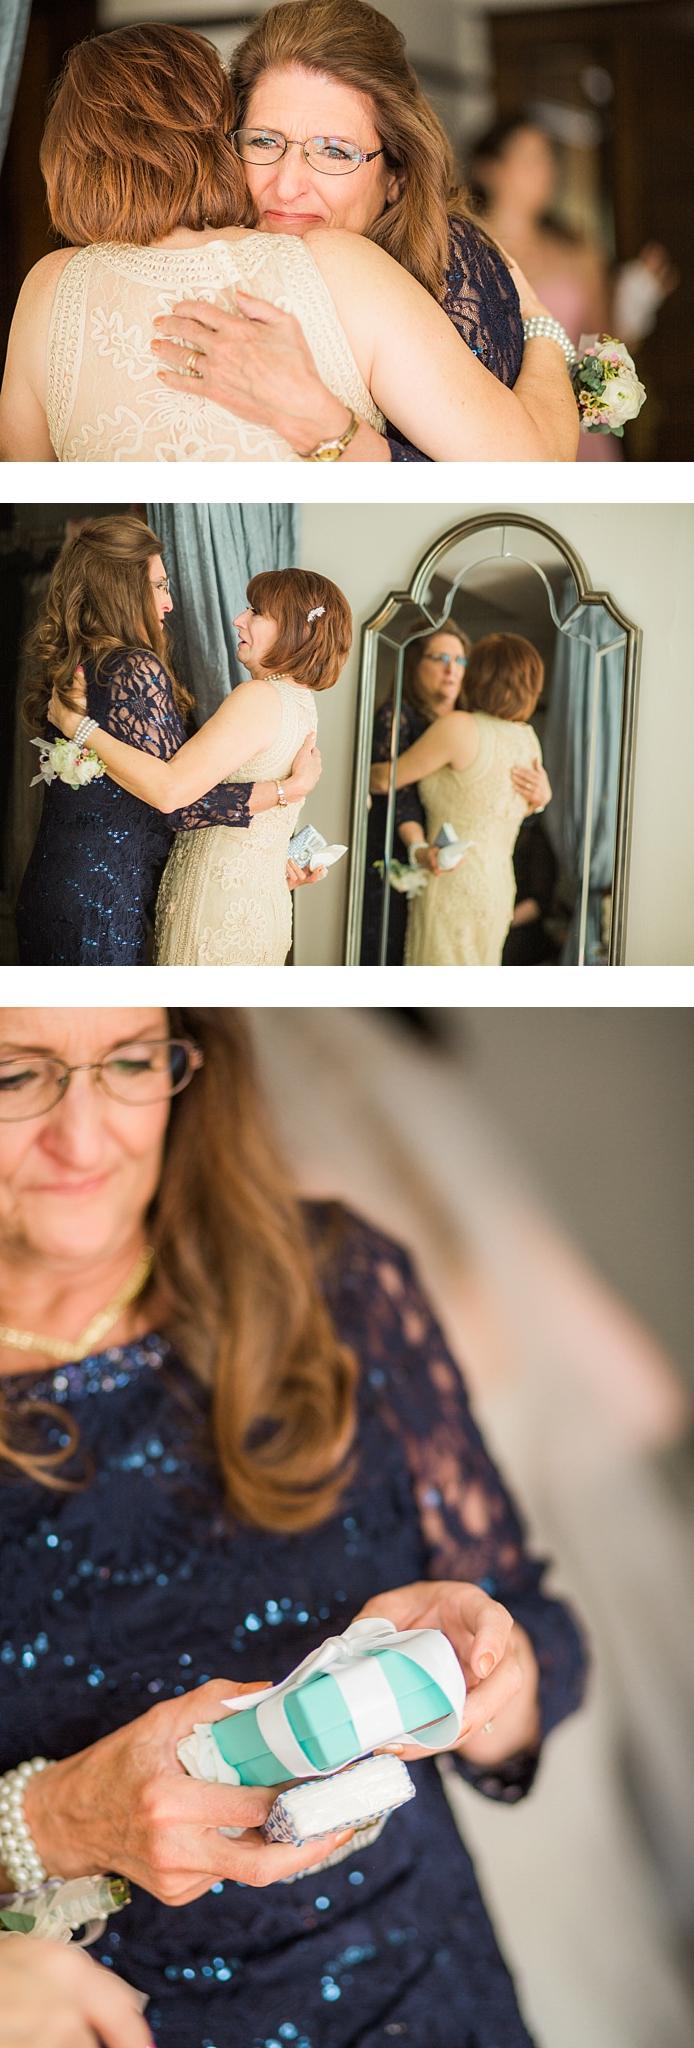 mother-wedding-gifts.jpg